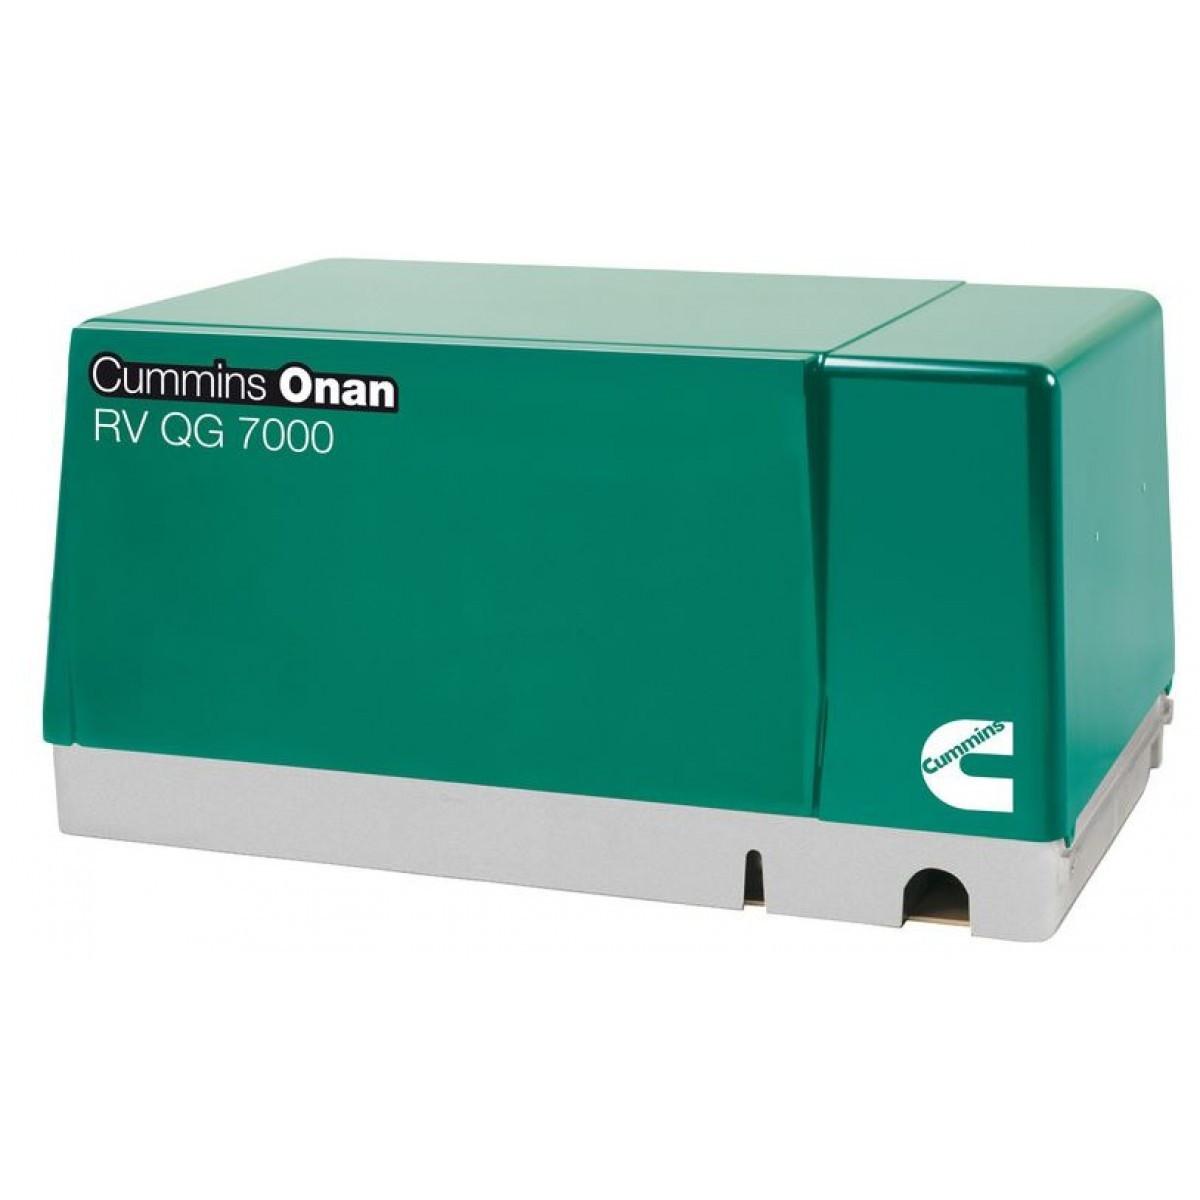 mins Onan 7HGJAB-1036 QG 7000W Gasoline RV Generator Wiring Diagram Switch Transfer Onan Otbca on